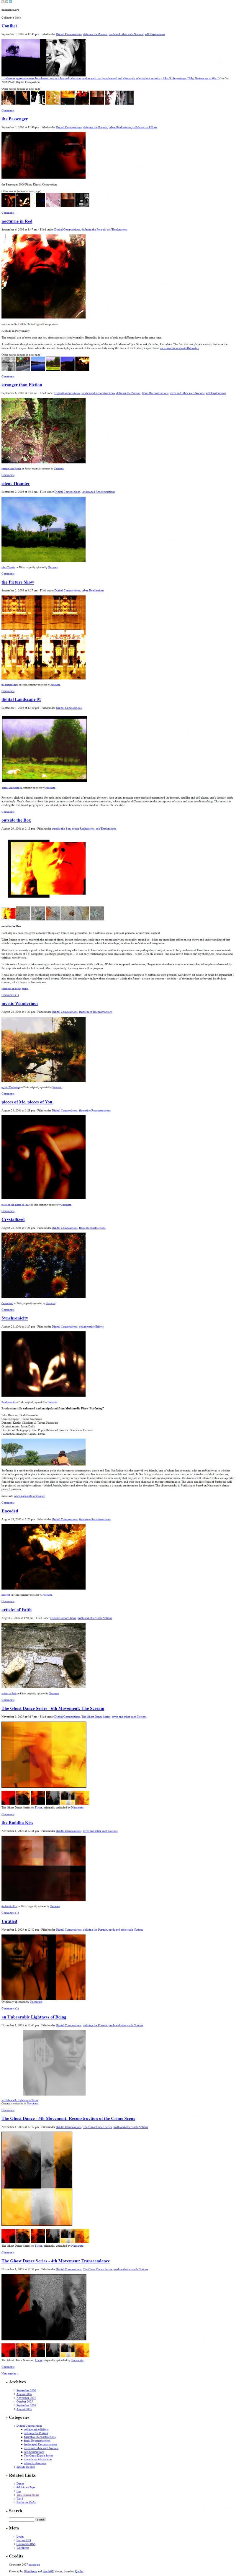 Naccarato.org Website, Wayback Machine, Internet Archive, February, 2007